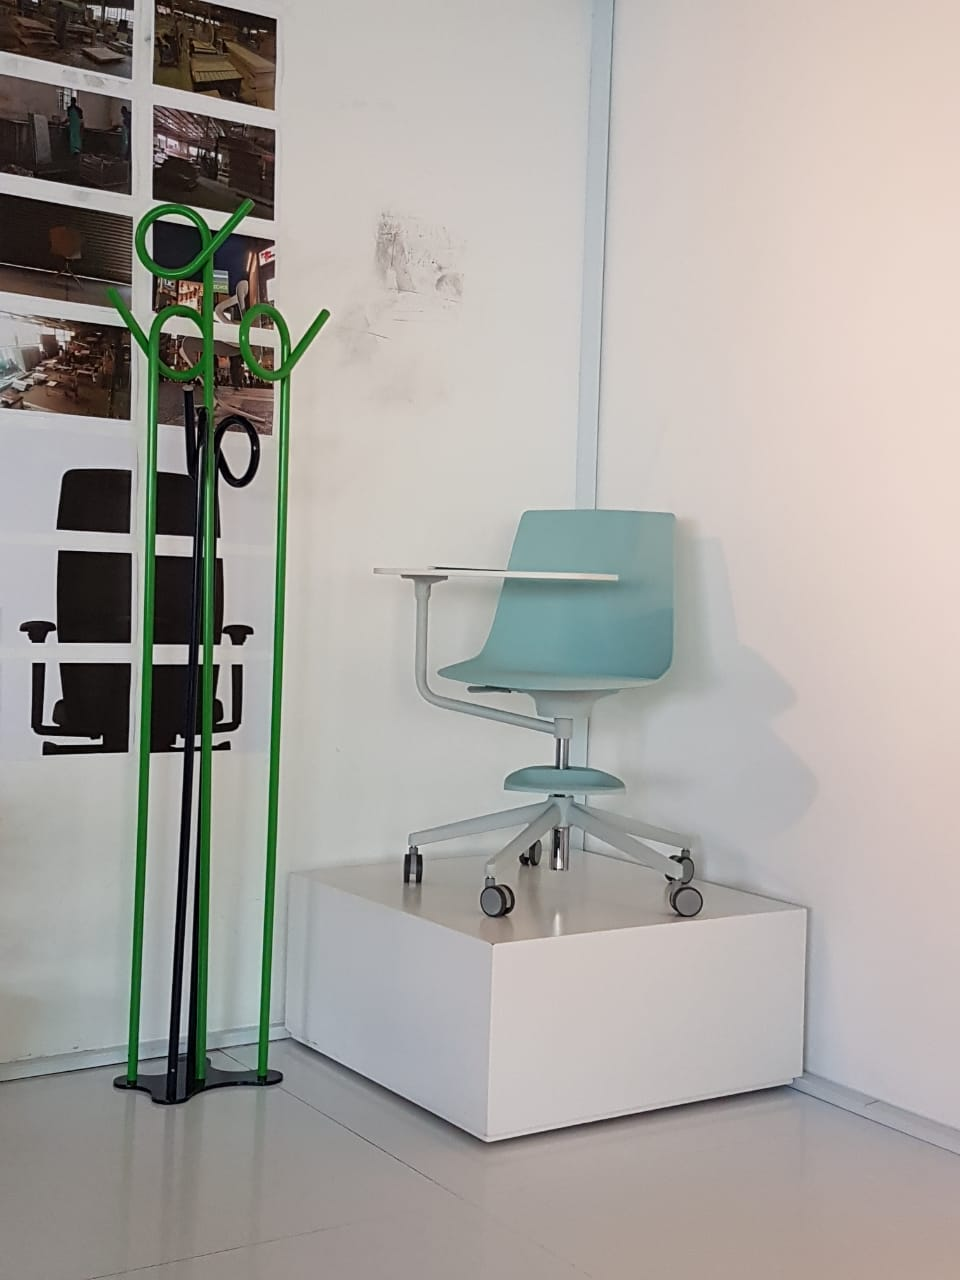 Coat Rack by ON&IN | chair by INFINITI   BELOW  clock by MAN&WIFE